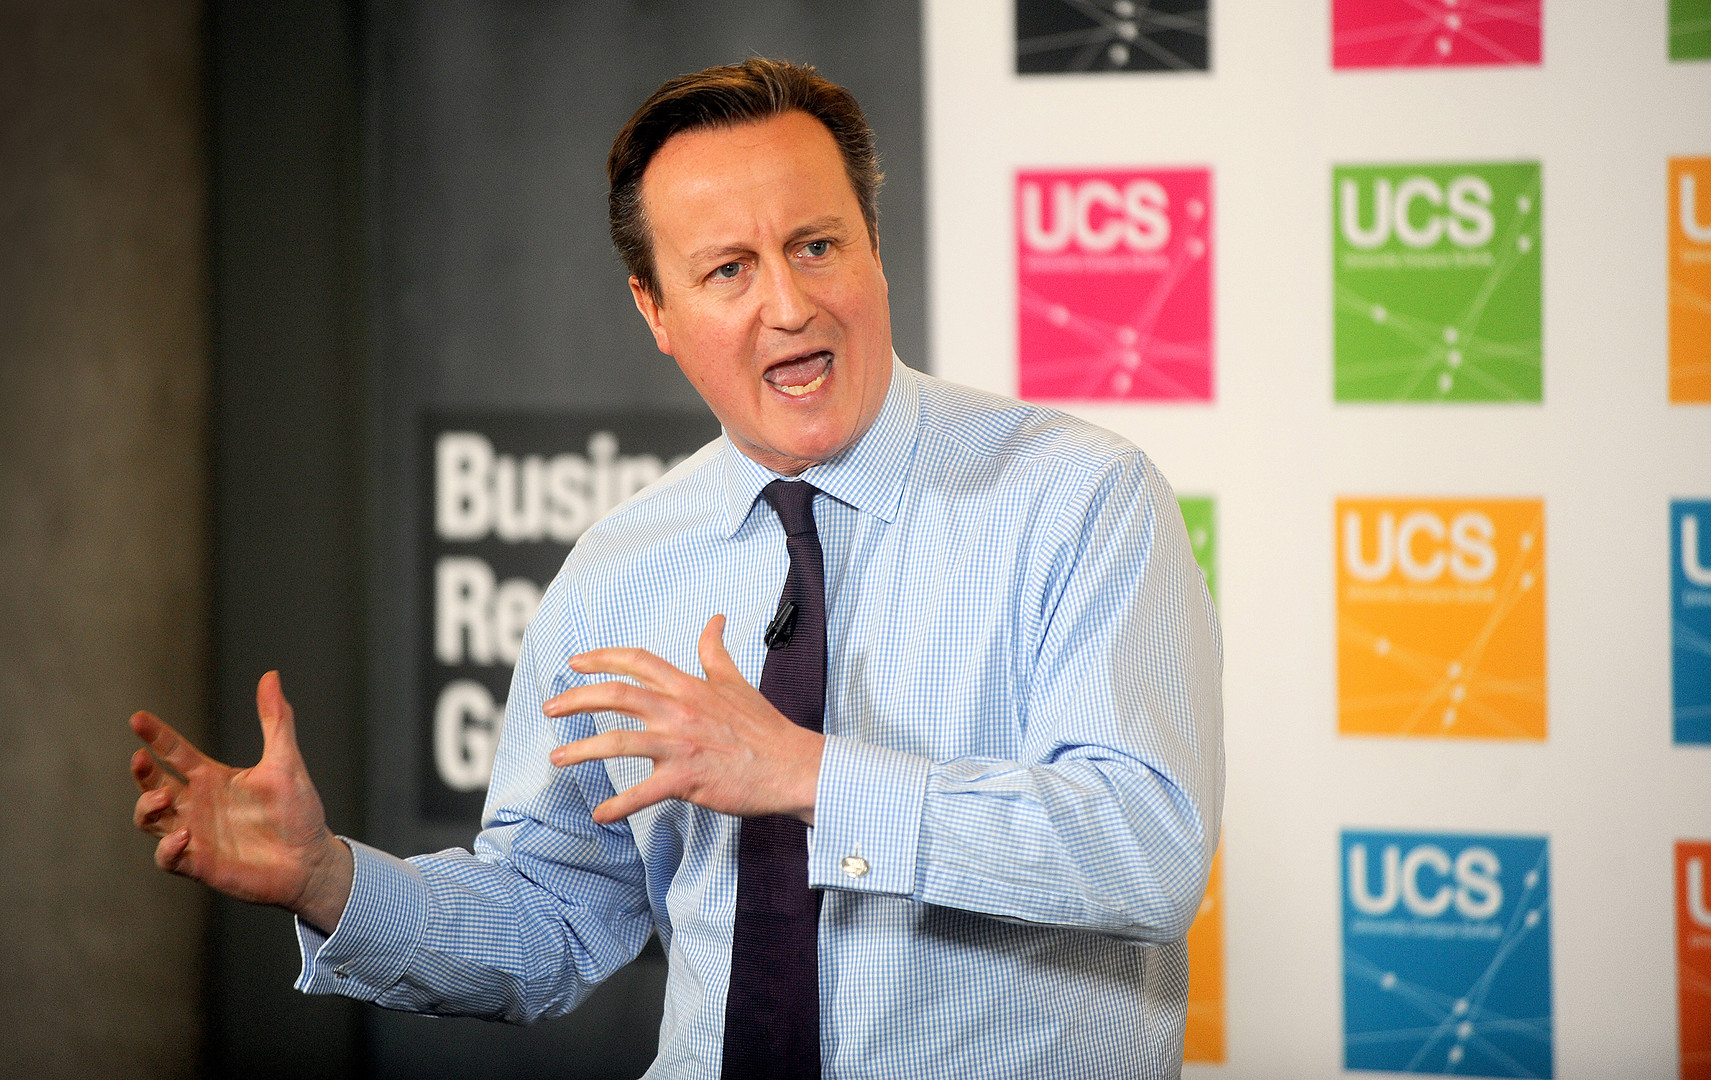 David Cameron speaking at the University of Suffolk